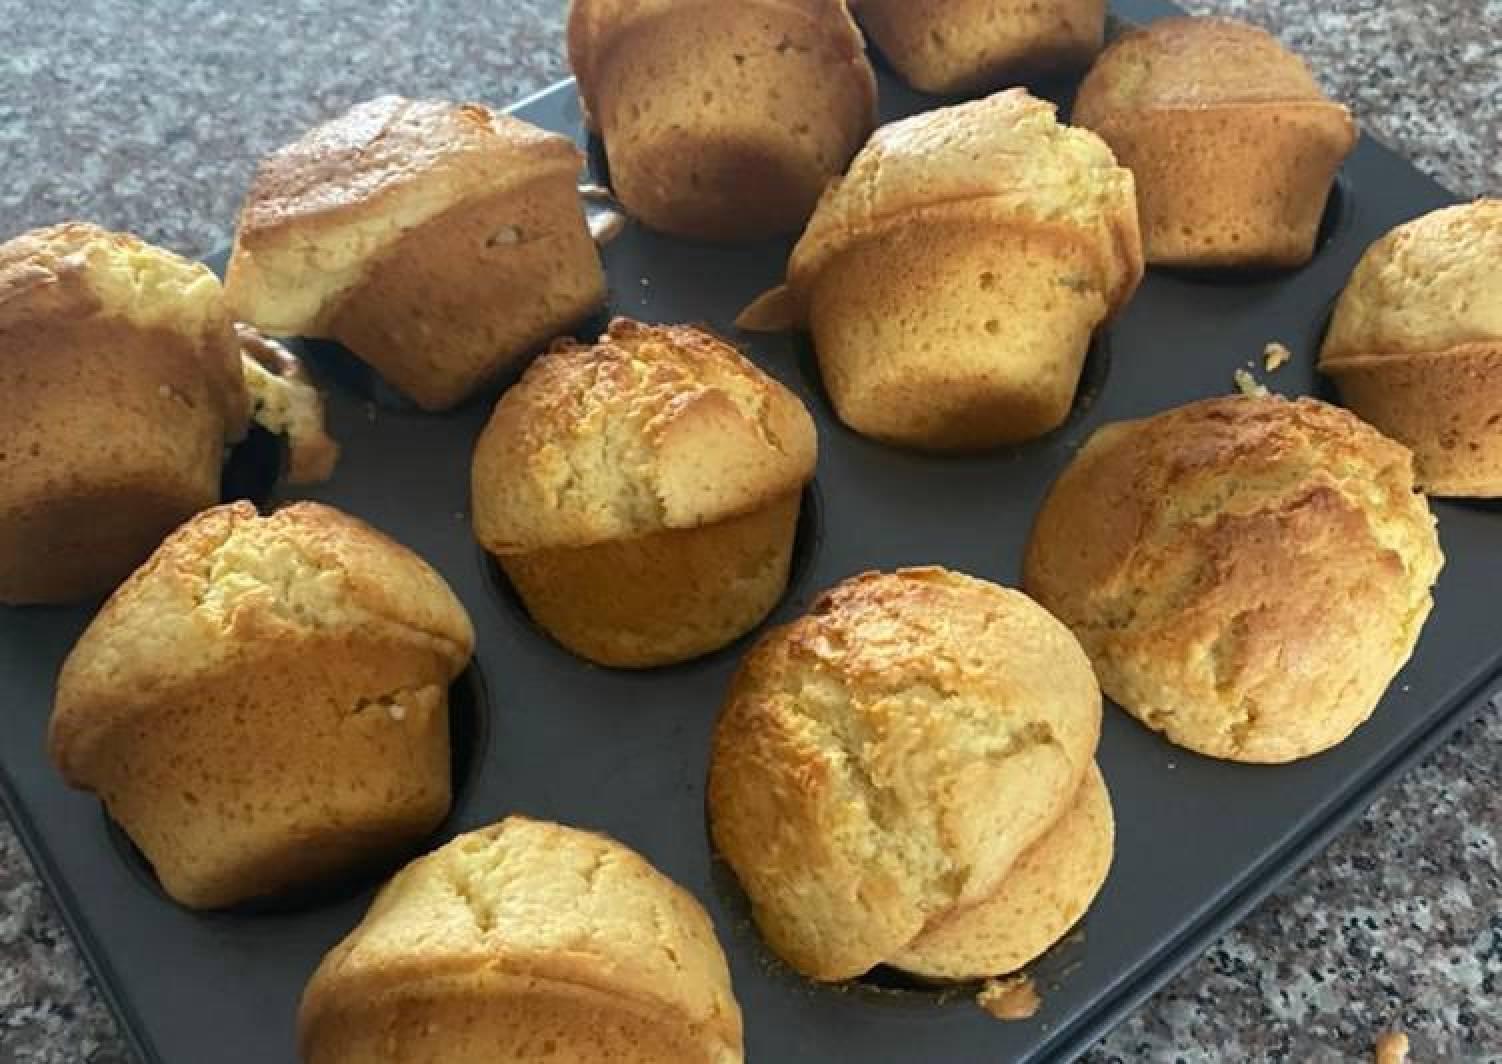 Sponge vanilla muffins